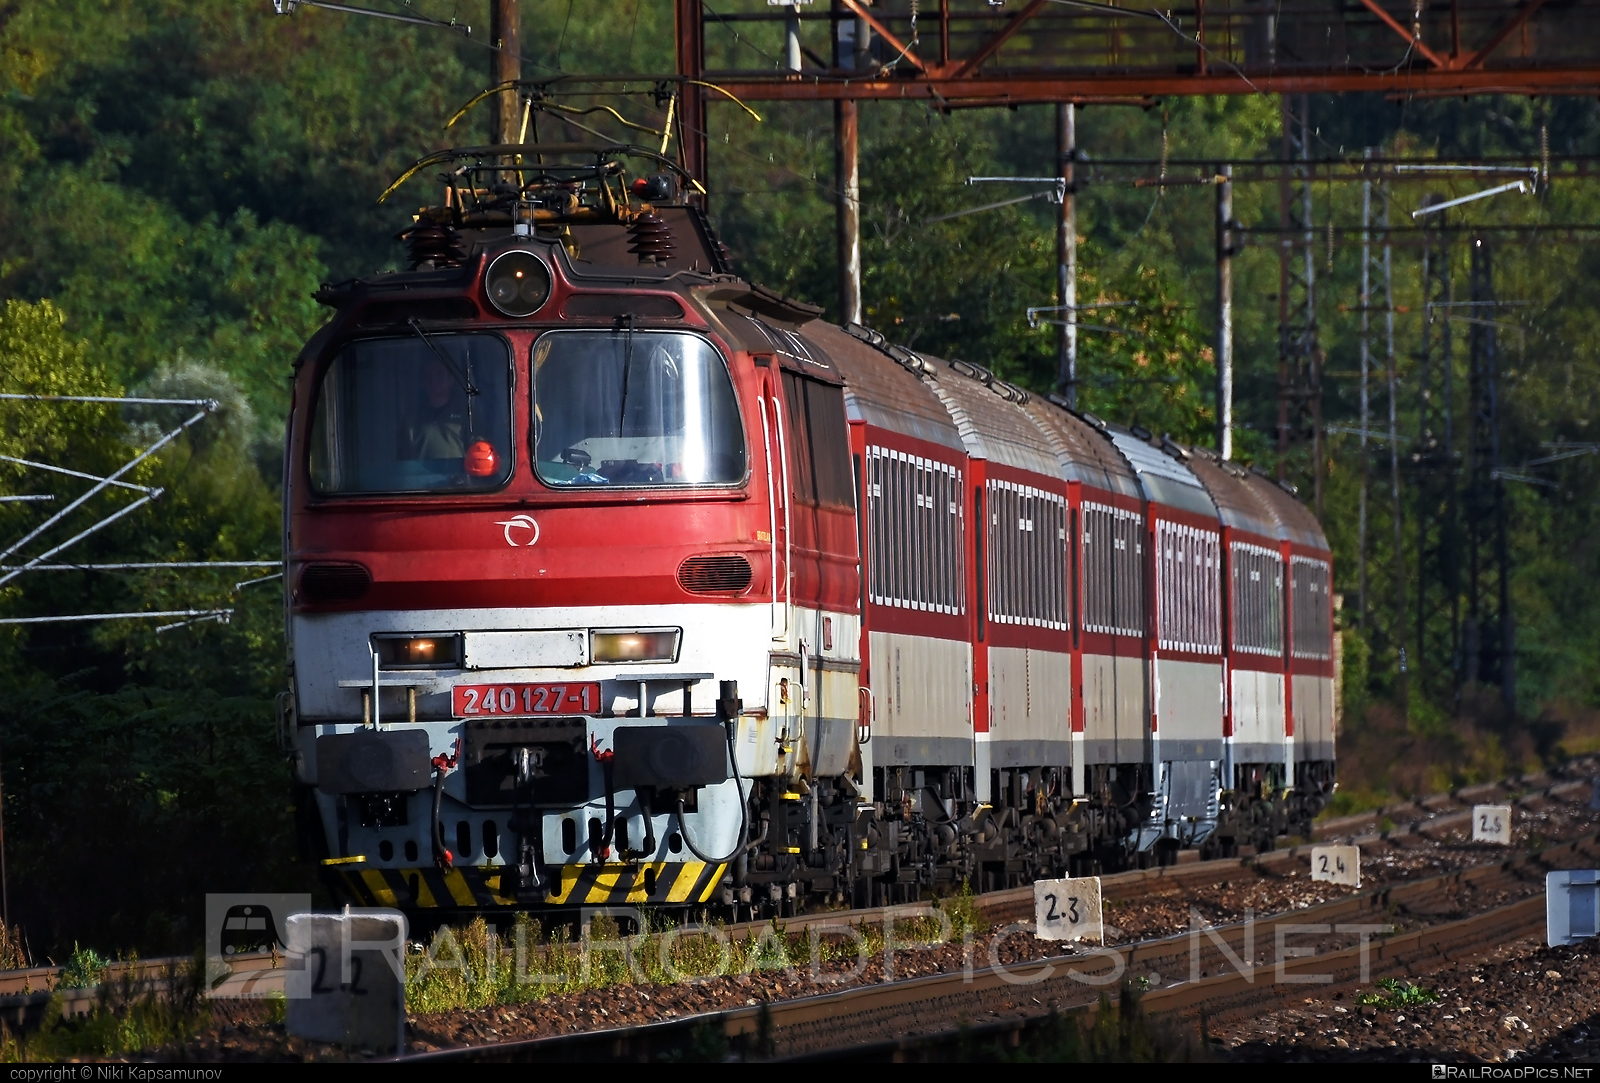 Škoda 47E - 240 127-1 operated by Železničná Spoločnost' Slovensko, a.s. #ZeleznicnaSpolocnostSlovensko #laminatka #locomotive240 #skoda #skoda47e #zssk